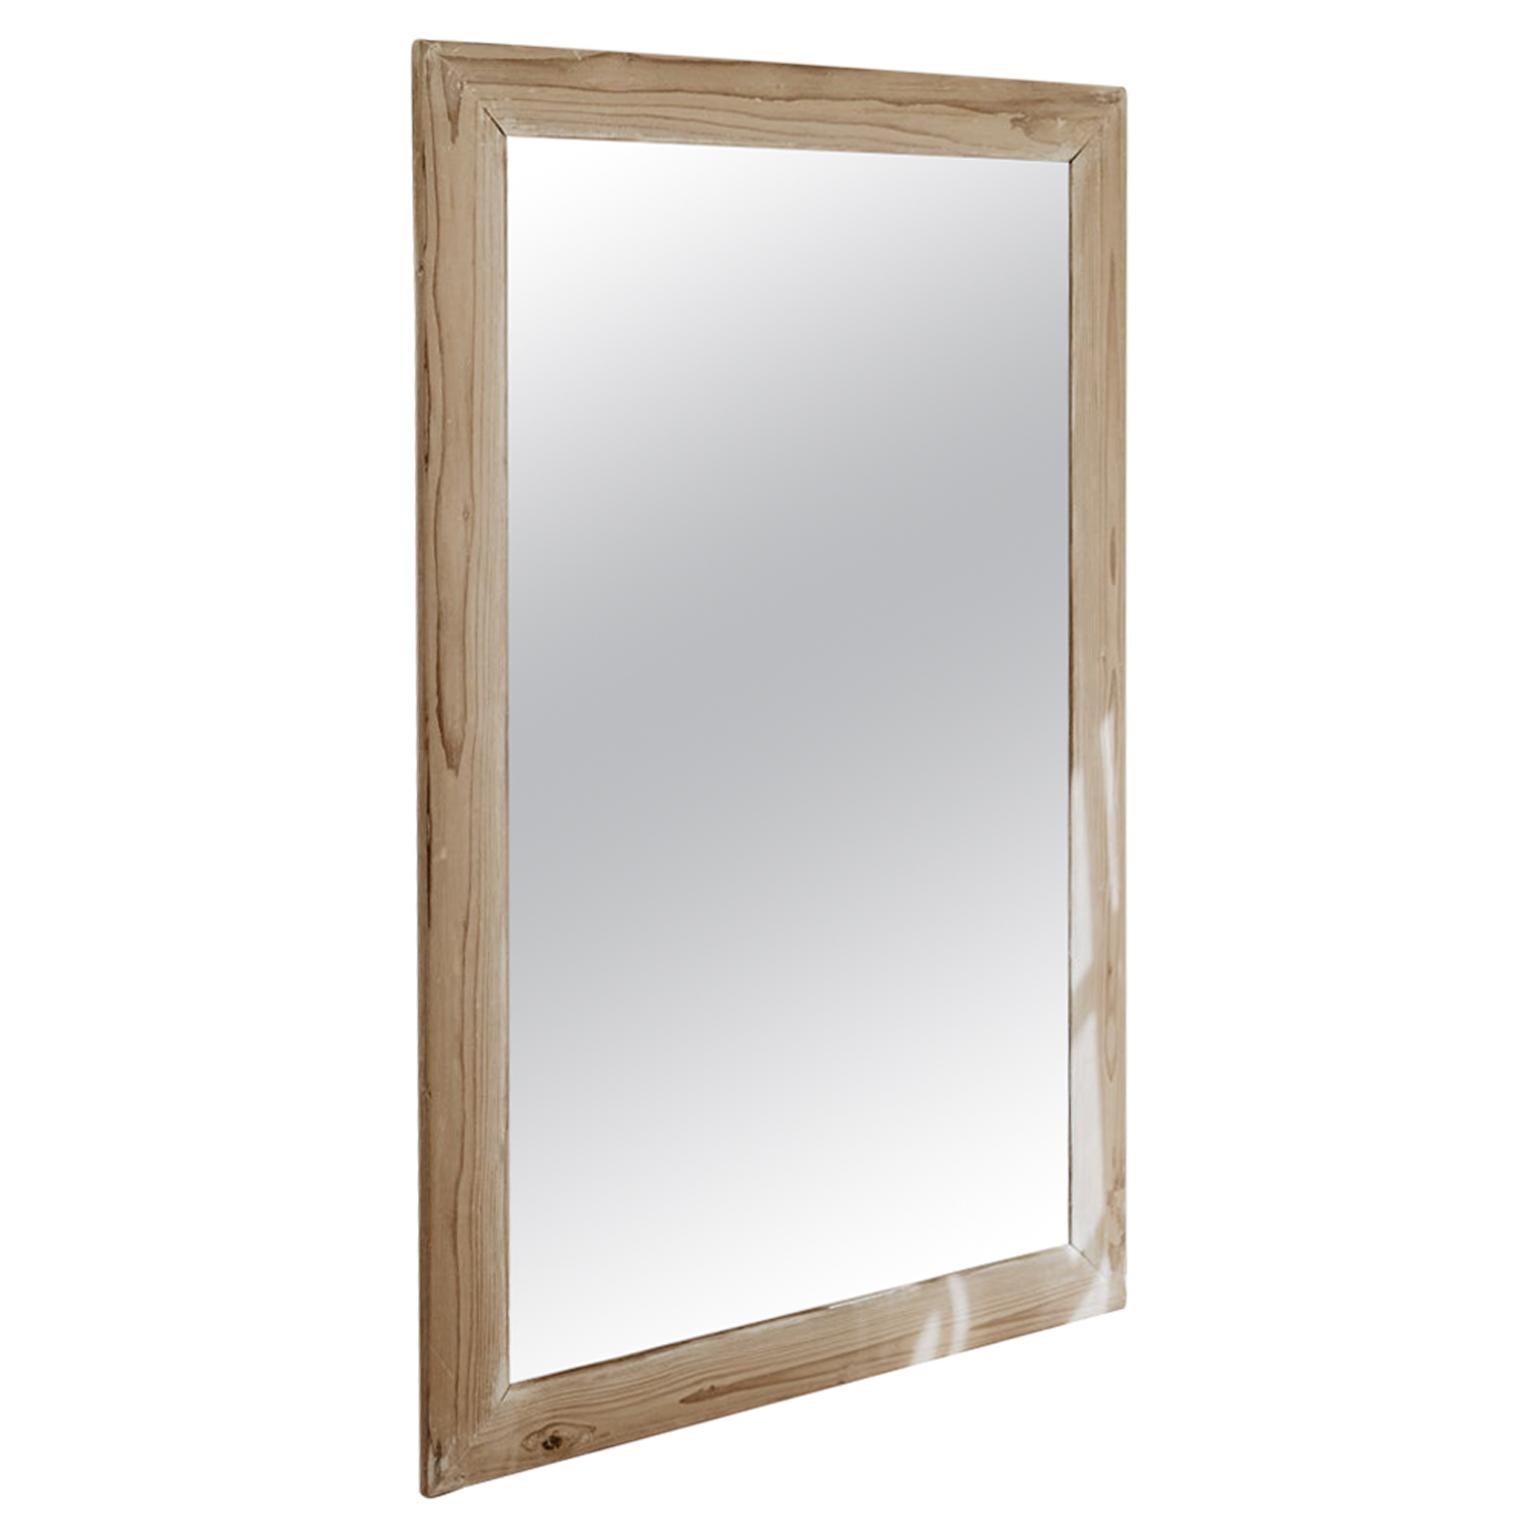 19th Century French Pine Mirror